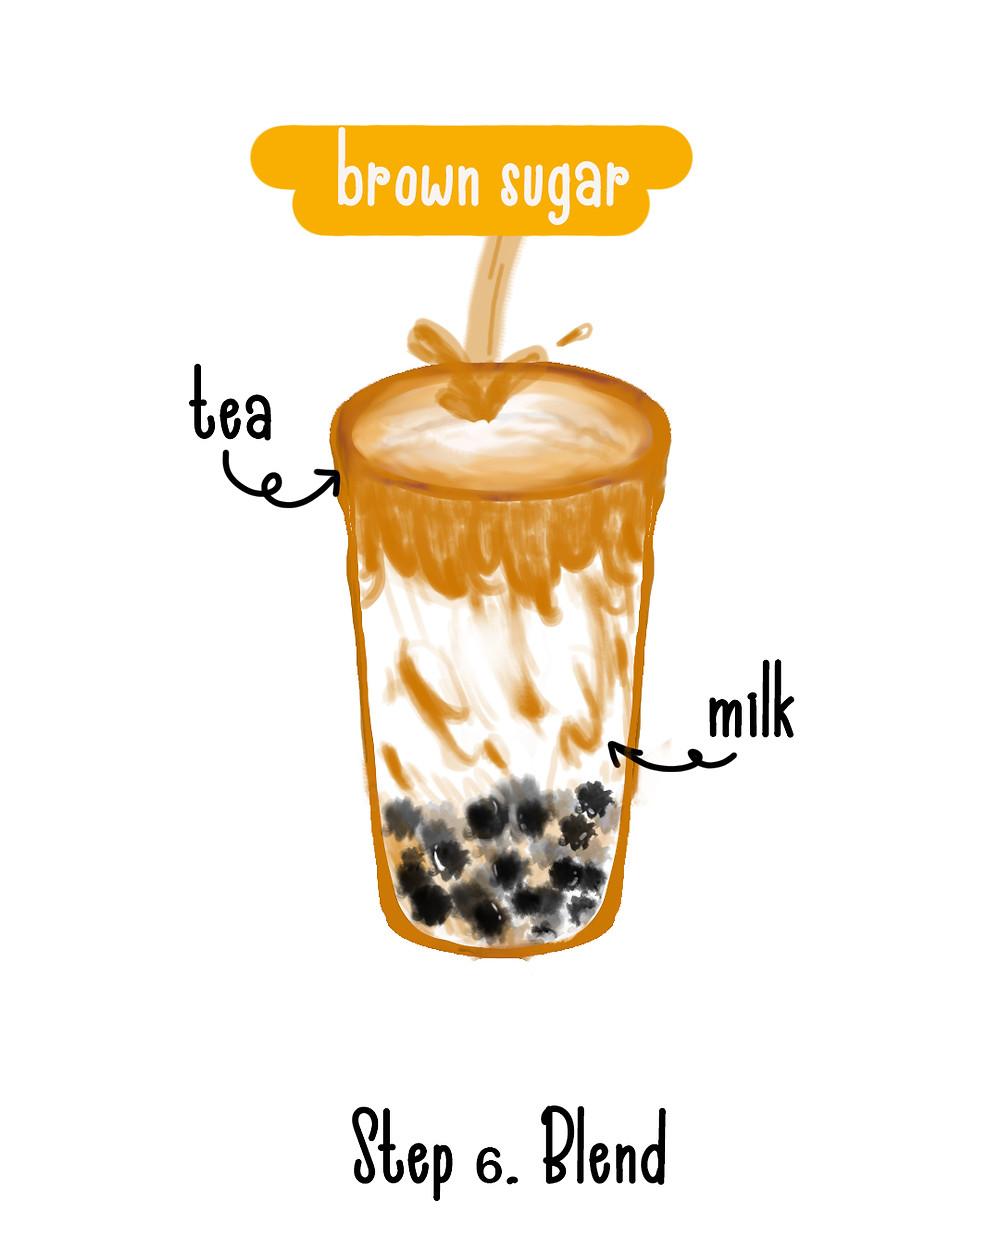 Step 6 to make brown sugar boba - Blend milk tea